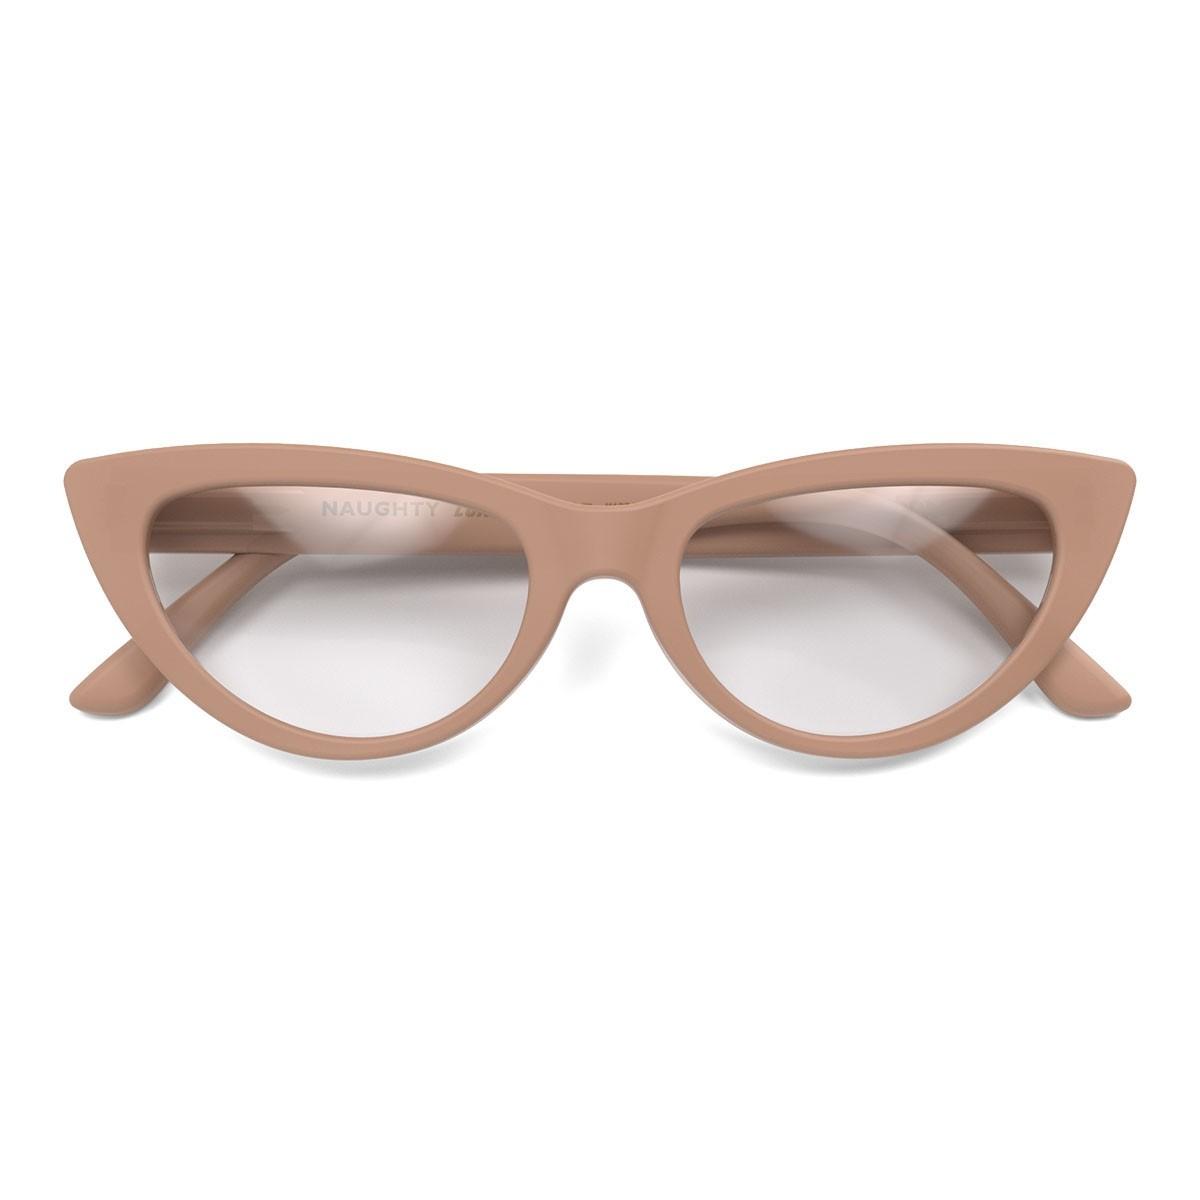 London Mole Naughty Blue Blocker Glasses Soft Pink